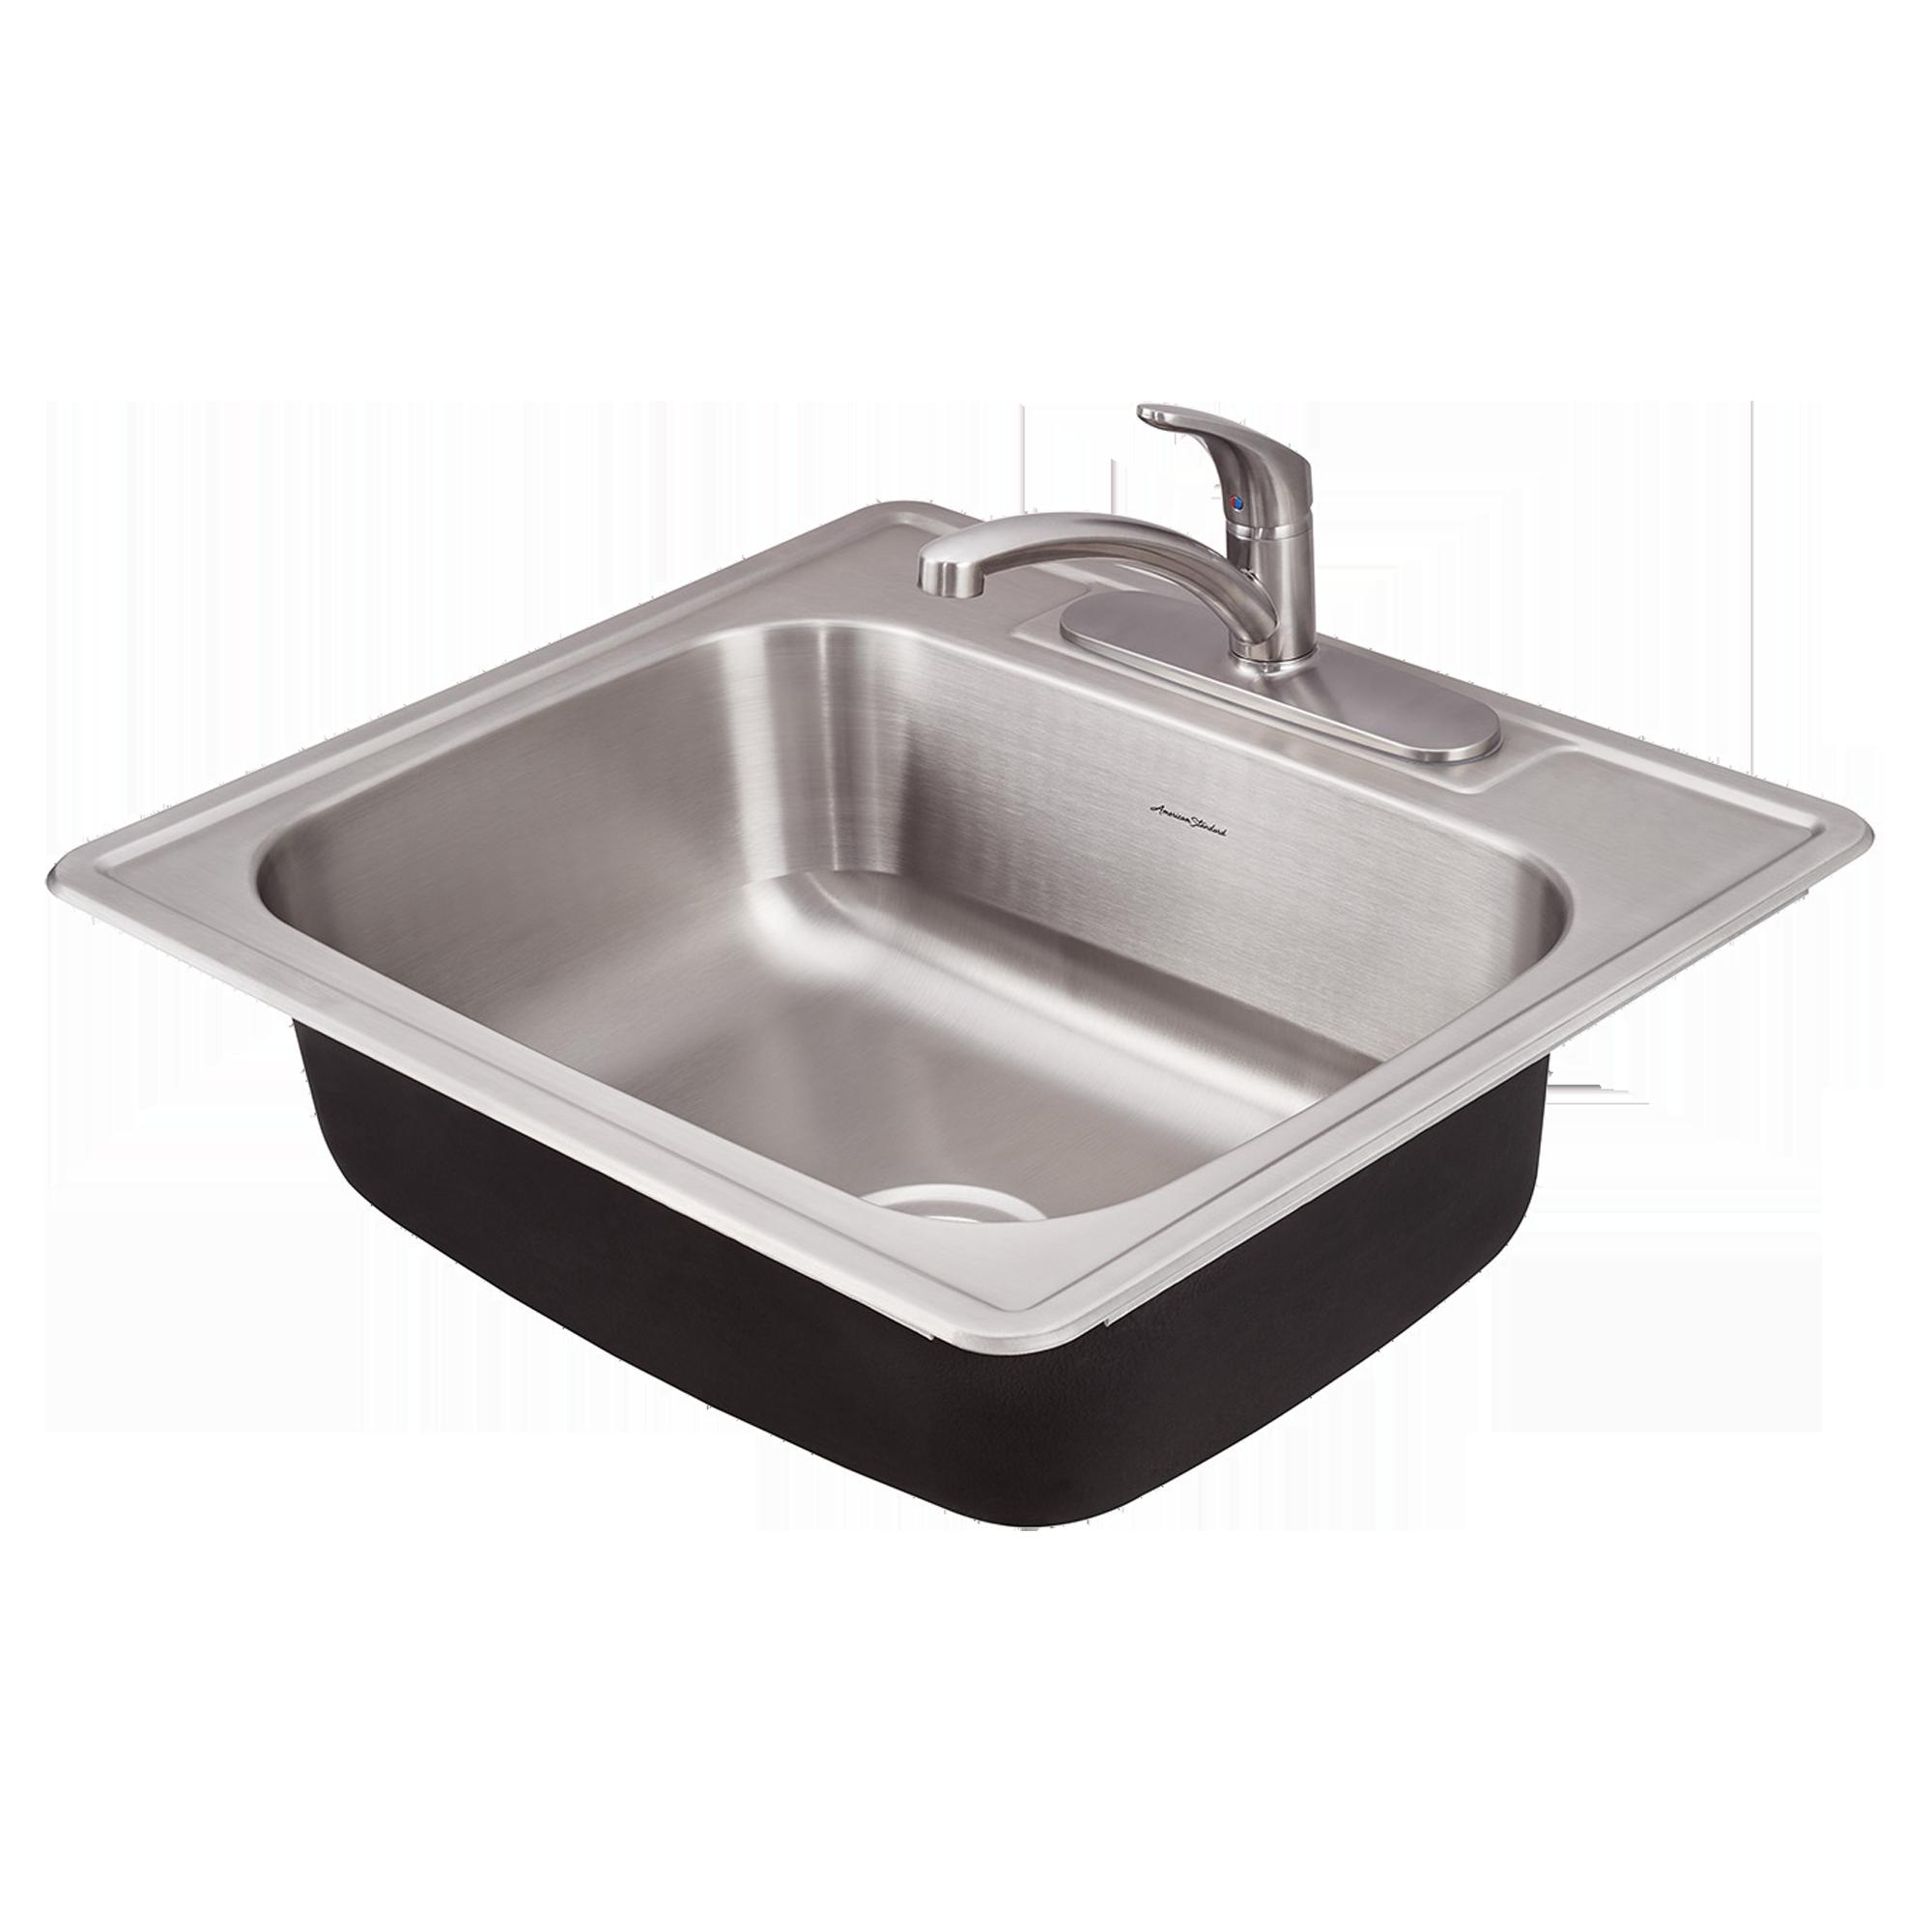 Best For Clogged Kitchen Sink